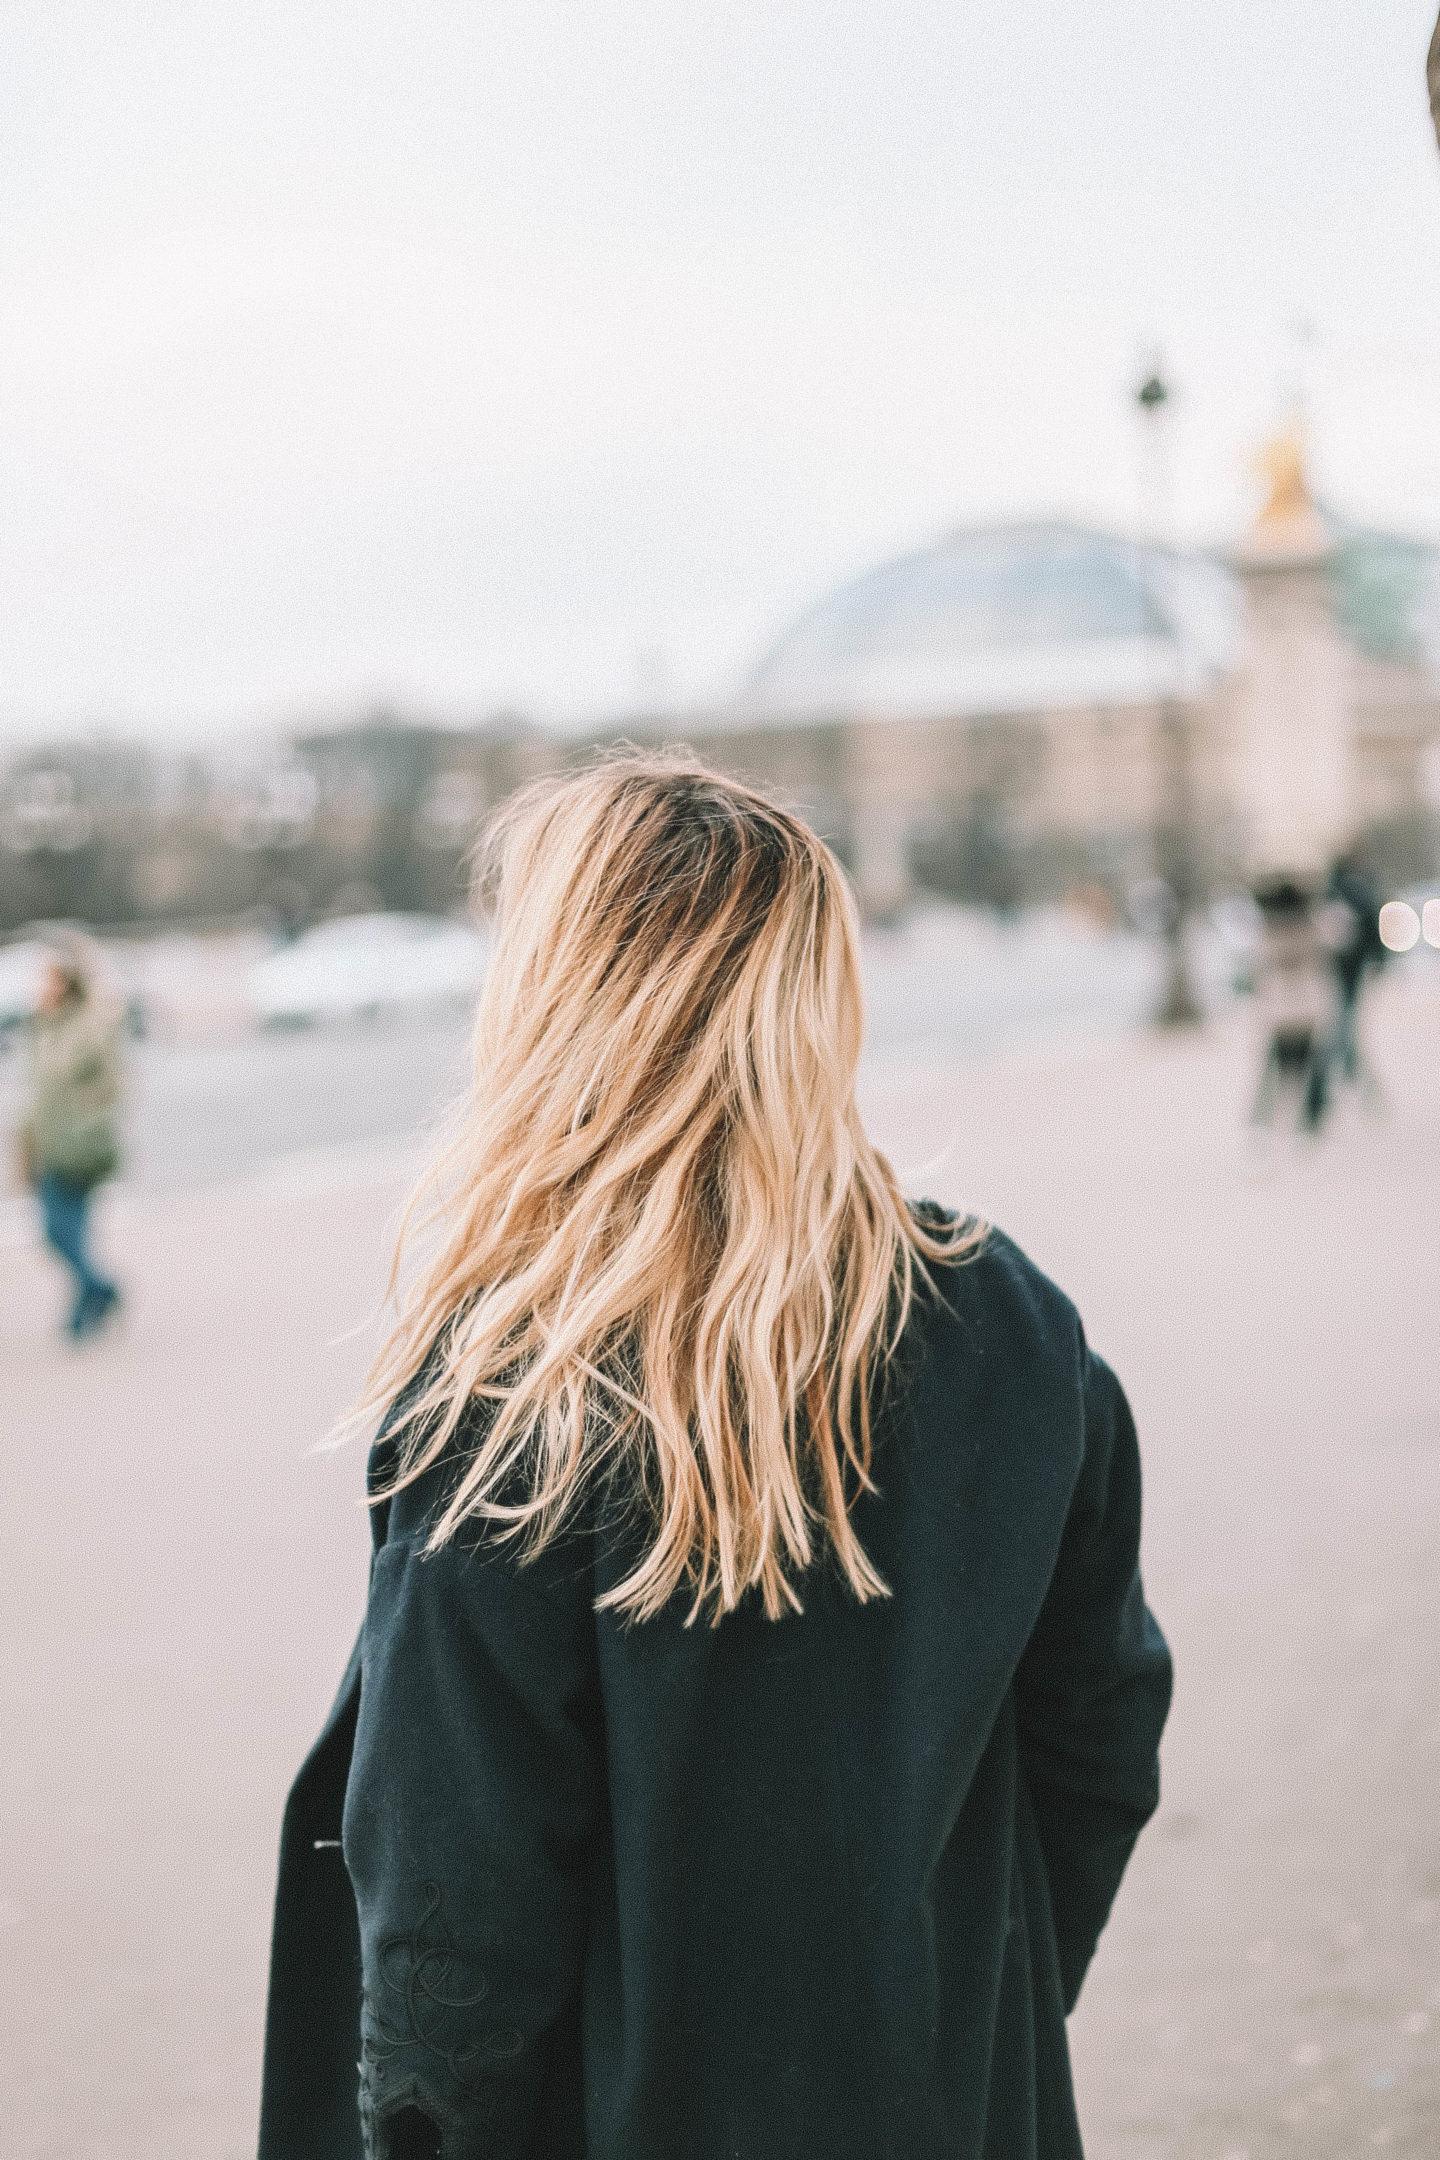 Comment entretenir son blond - Blondie Baby blog mode et voyages